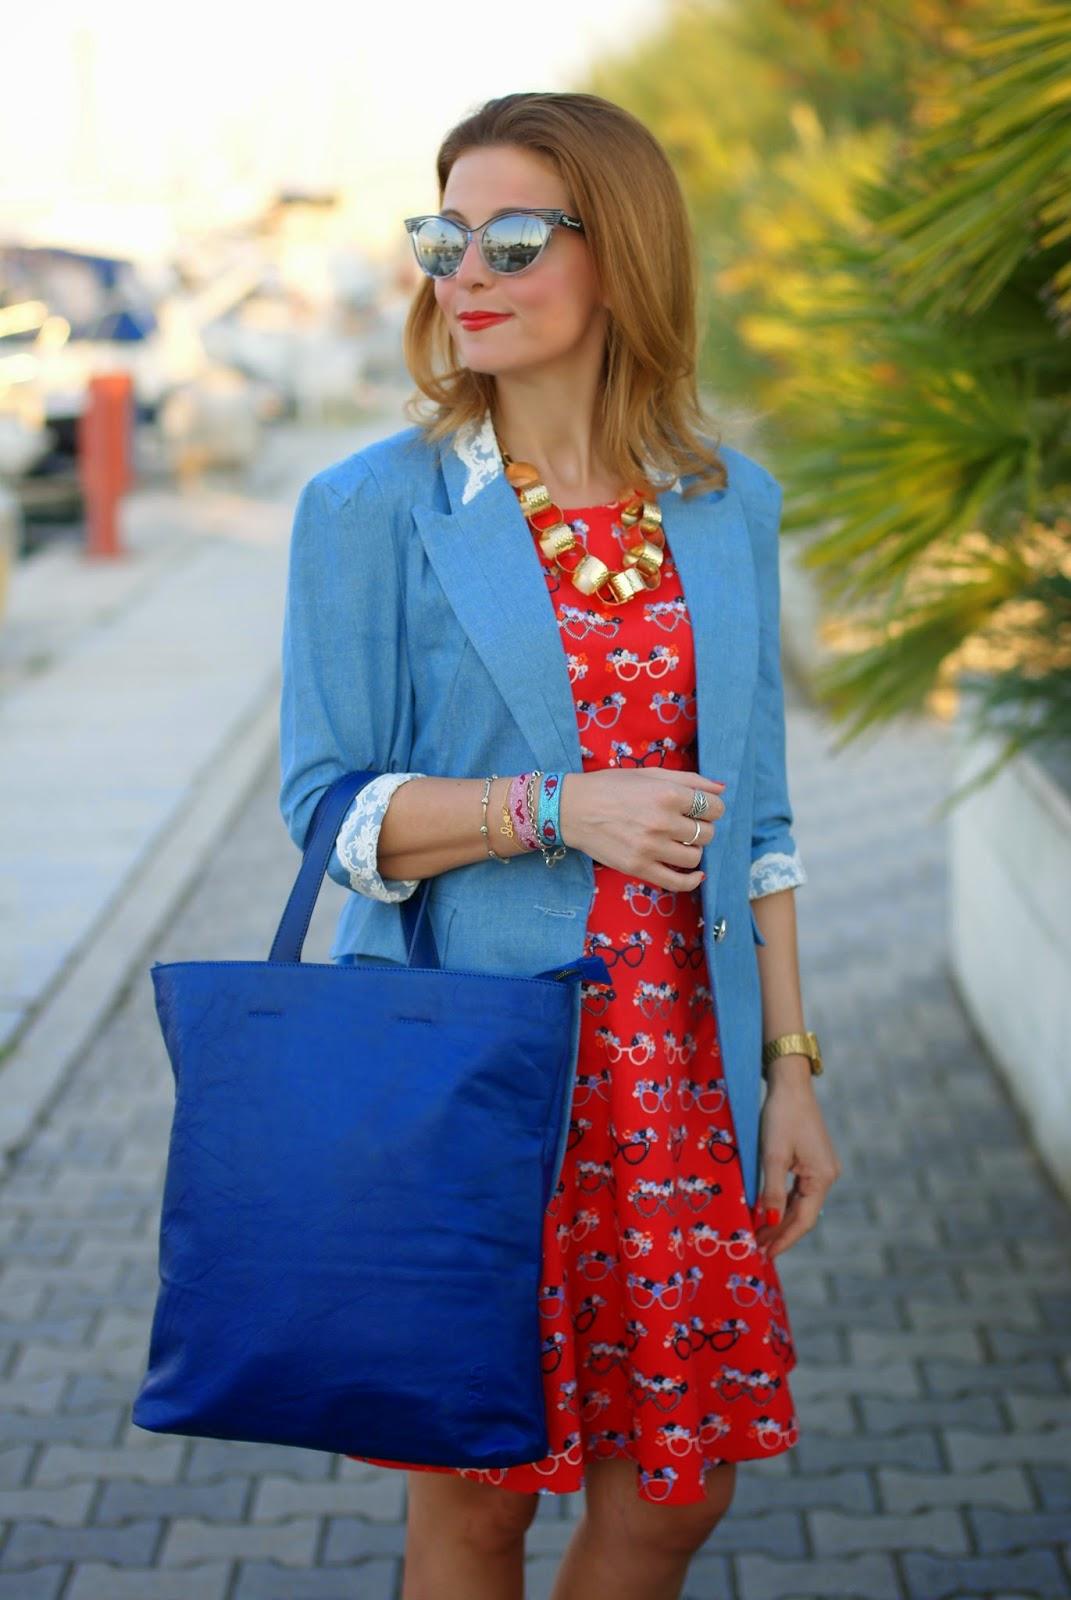 Blackfive denim blazer, nava design shopper bag, yumi glasses print dress, Fashion and Cookies, fashion blogger